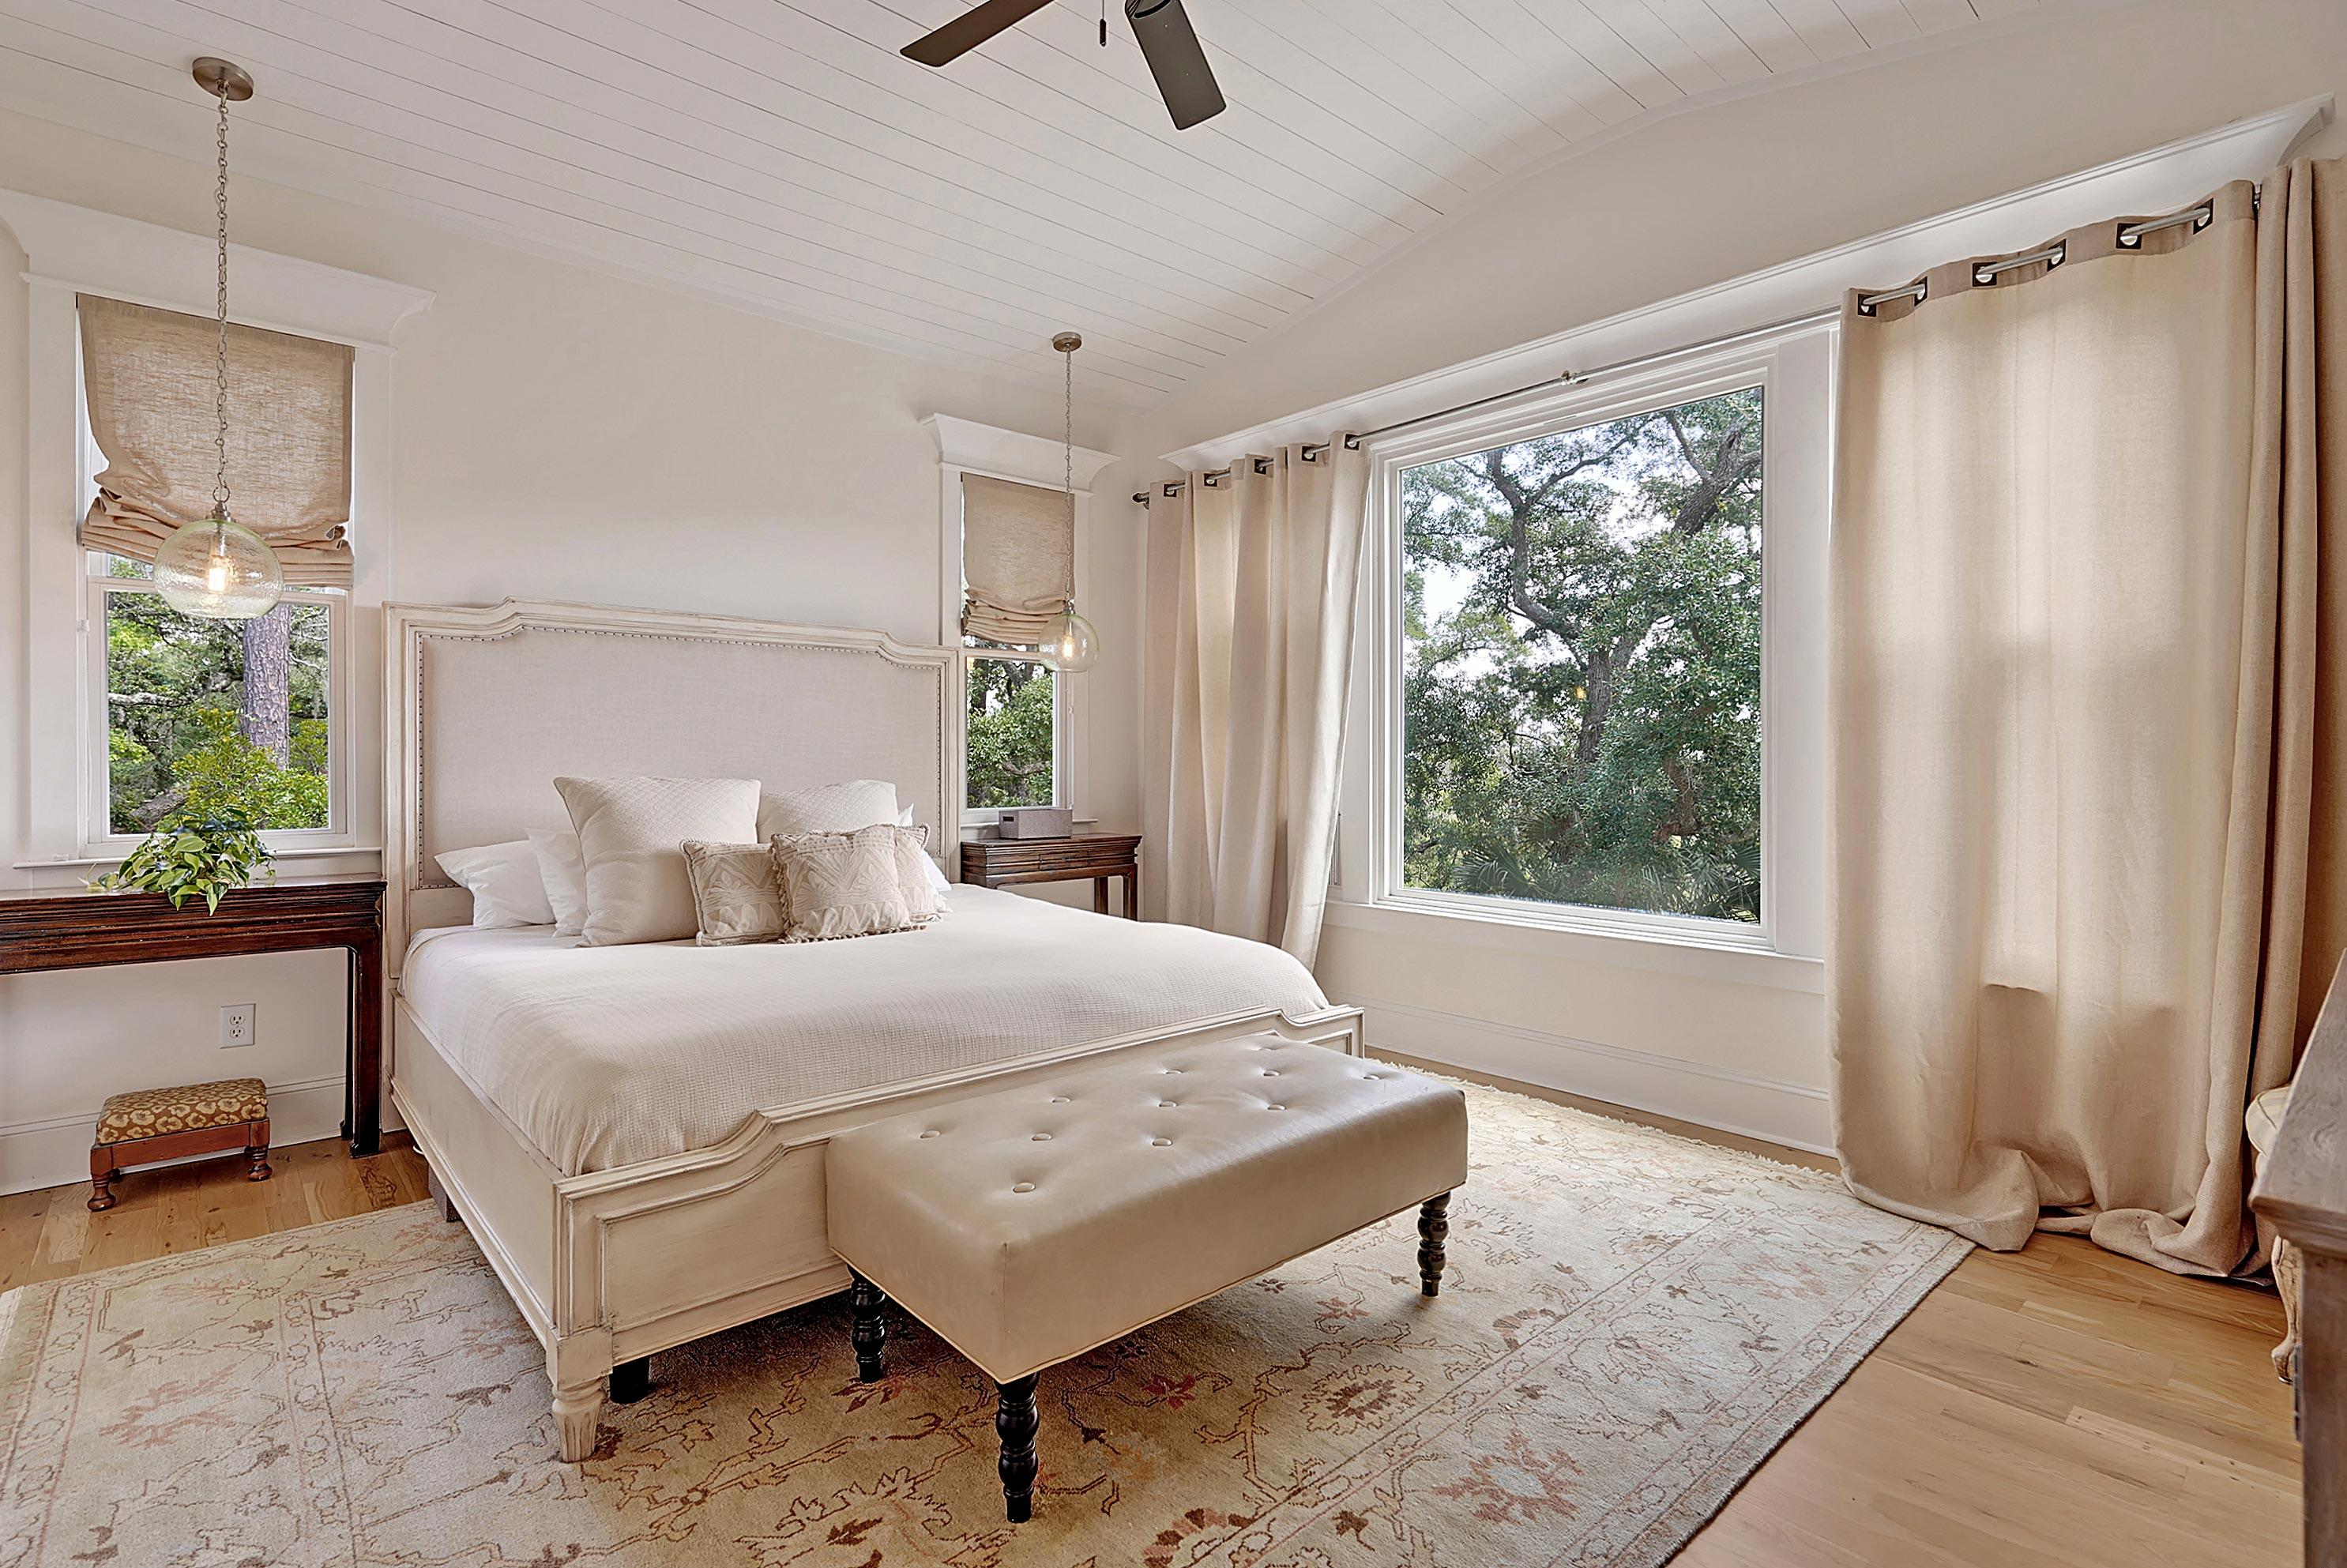 Grassy Creek Homes For Sale - 294 River Oak, Mount Pleasant, SC - 3